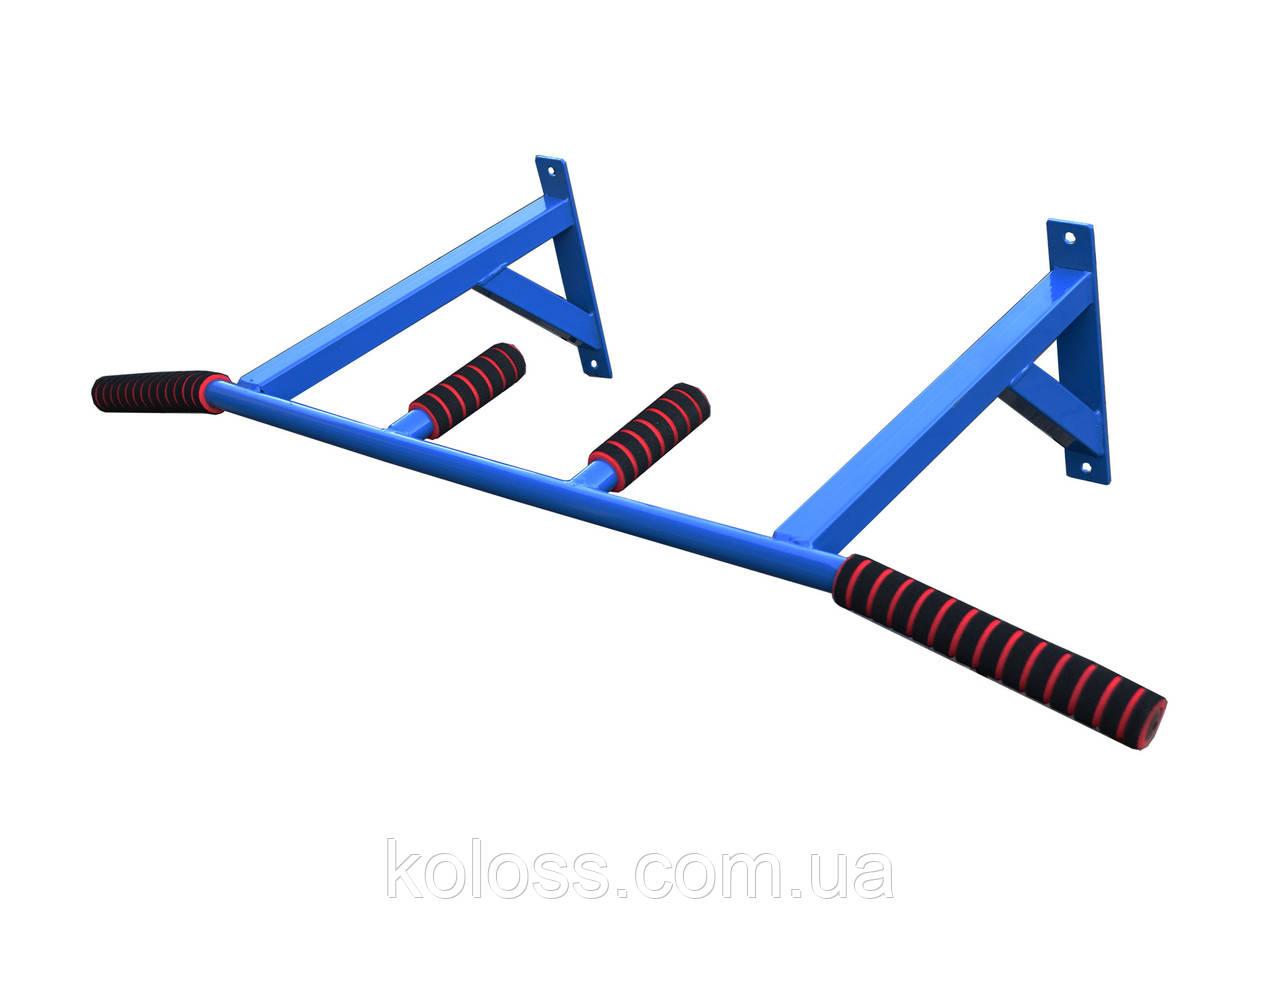 Турник настенный(синий) с узким хватом от TM Koloss-sport